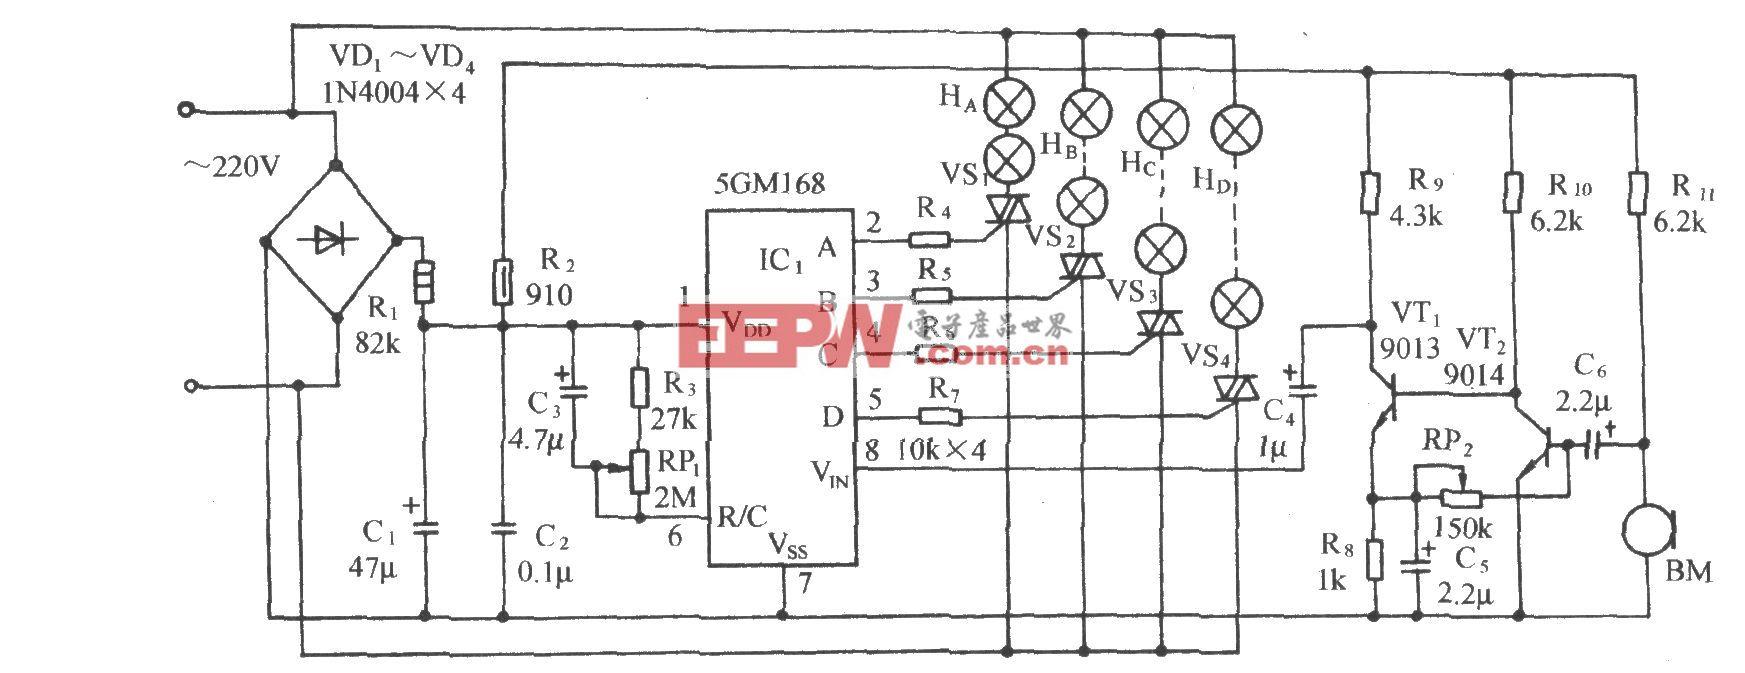 5GMl68音频压※控节日彩灯控制电路